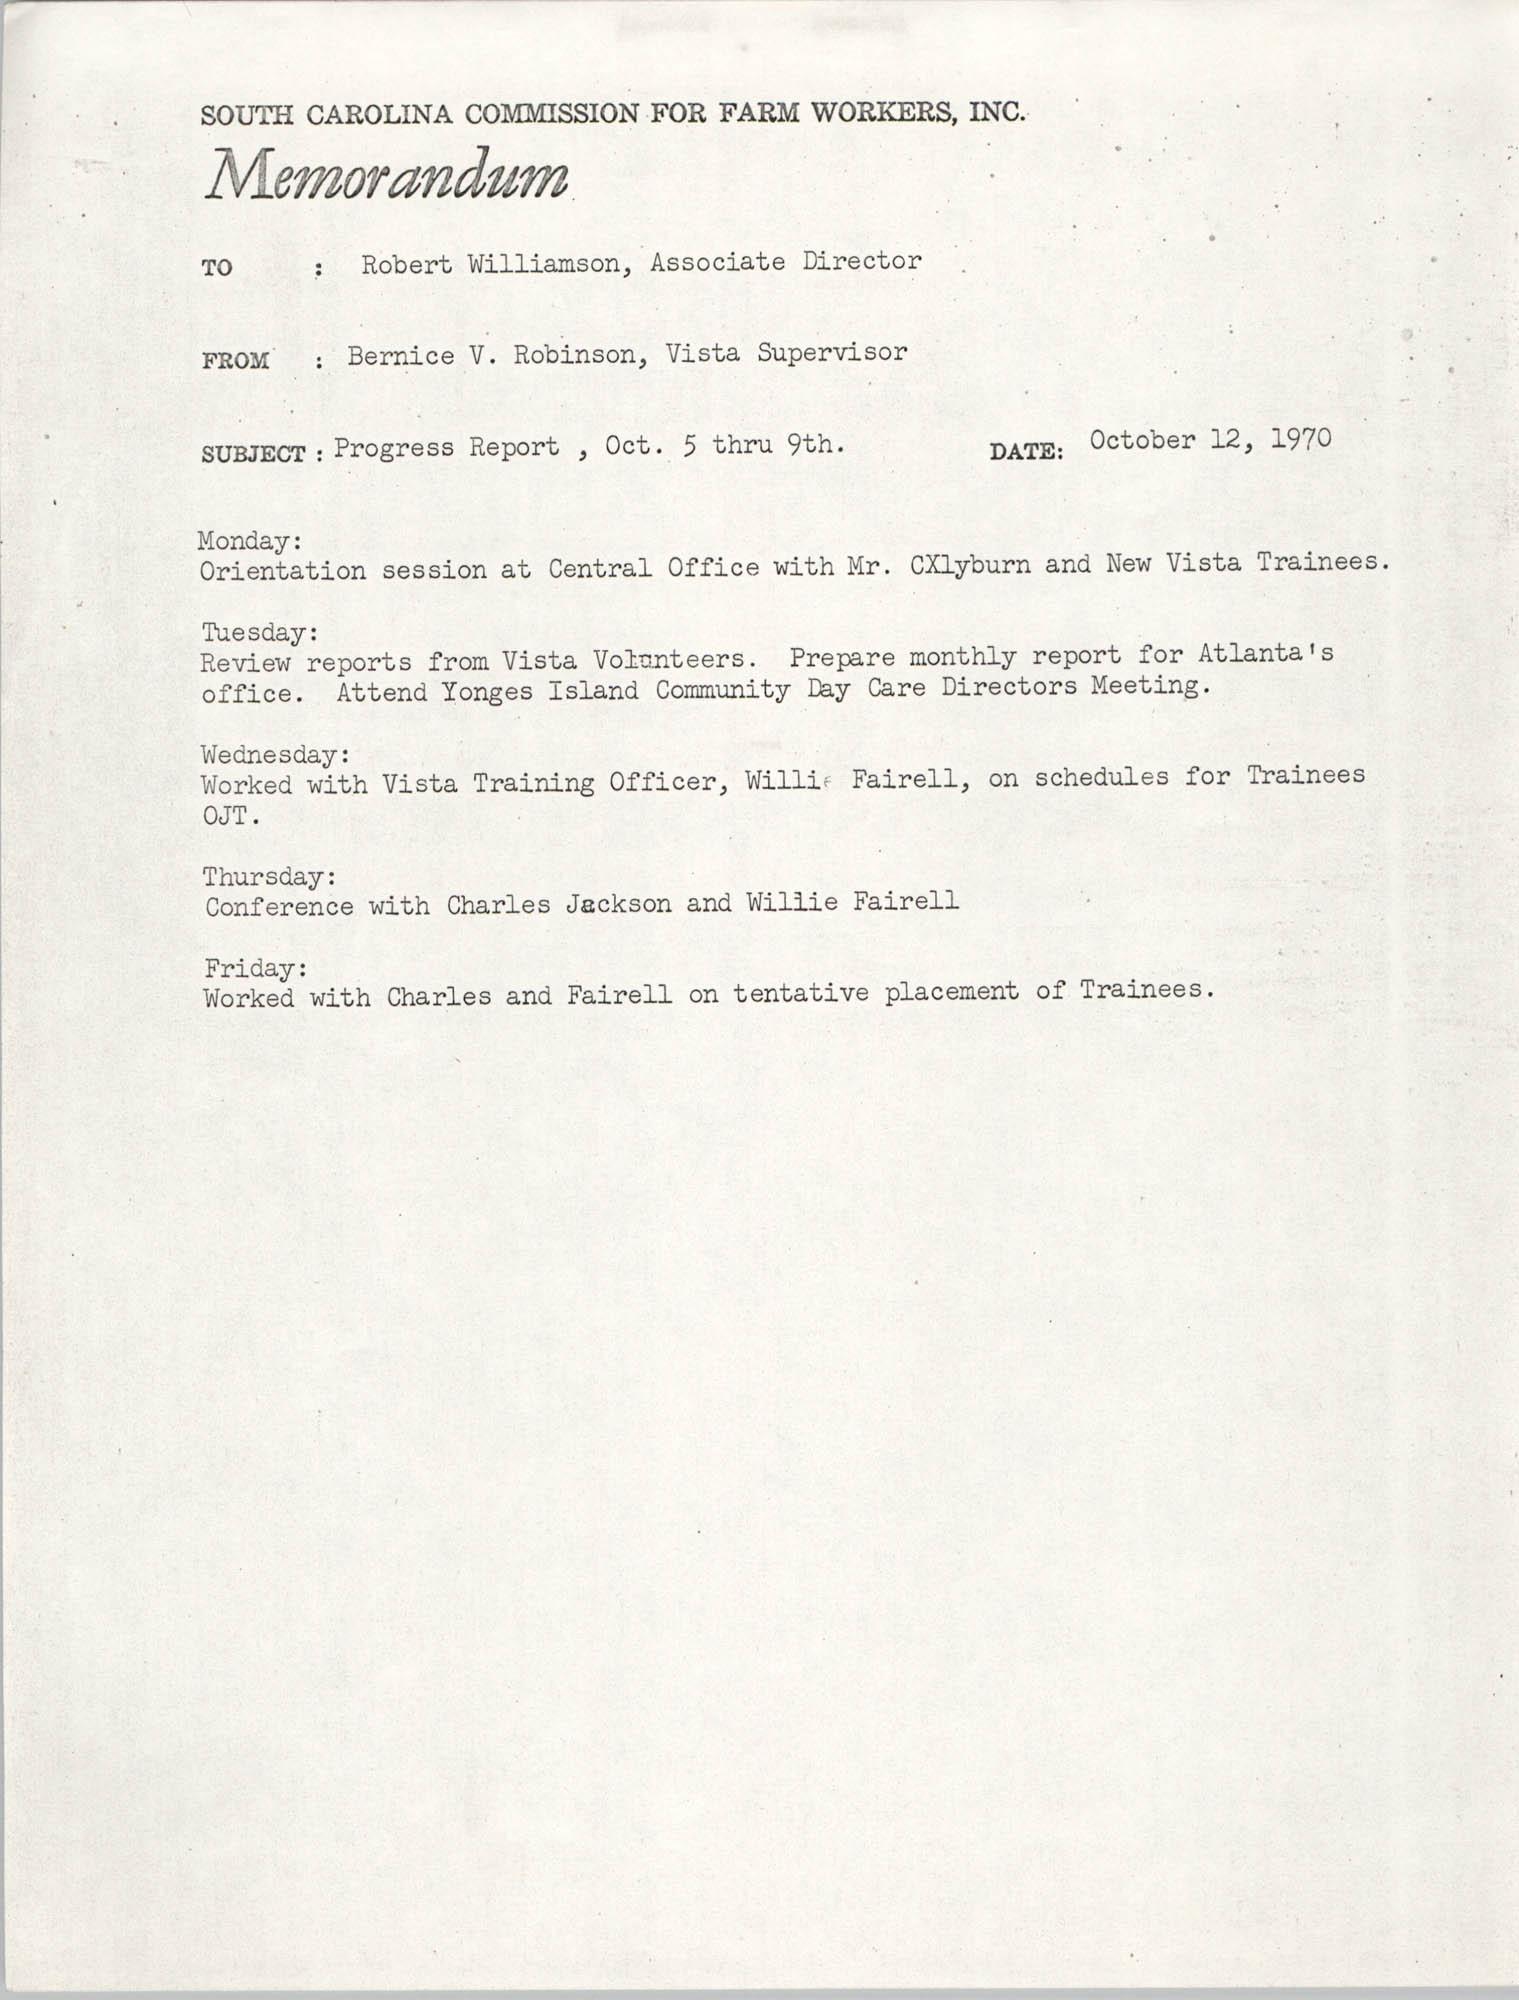 Memorandum from Bernice V. Robinson to Robert Williamson, October 12, 1970